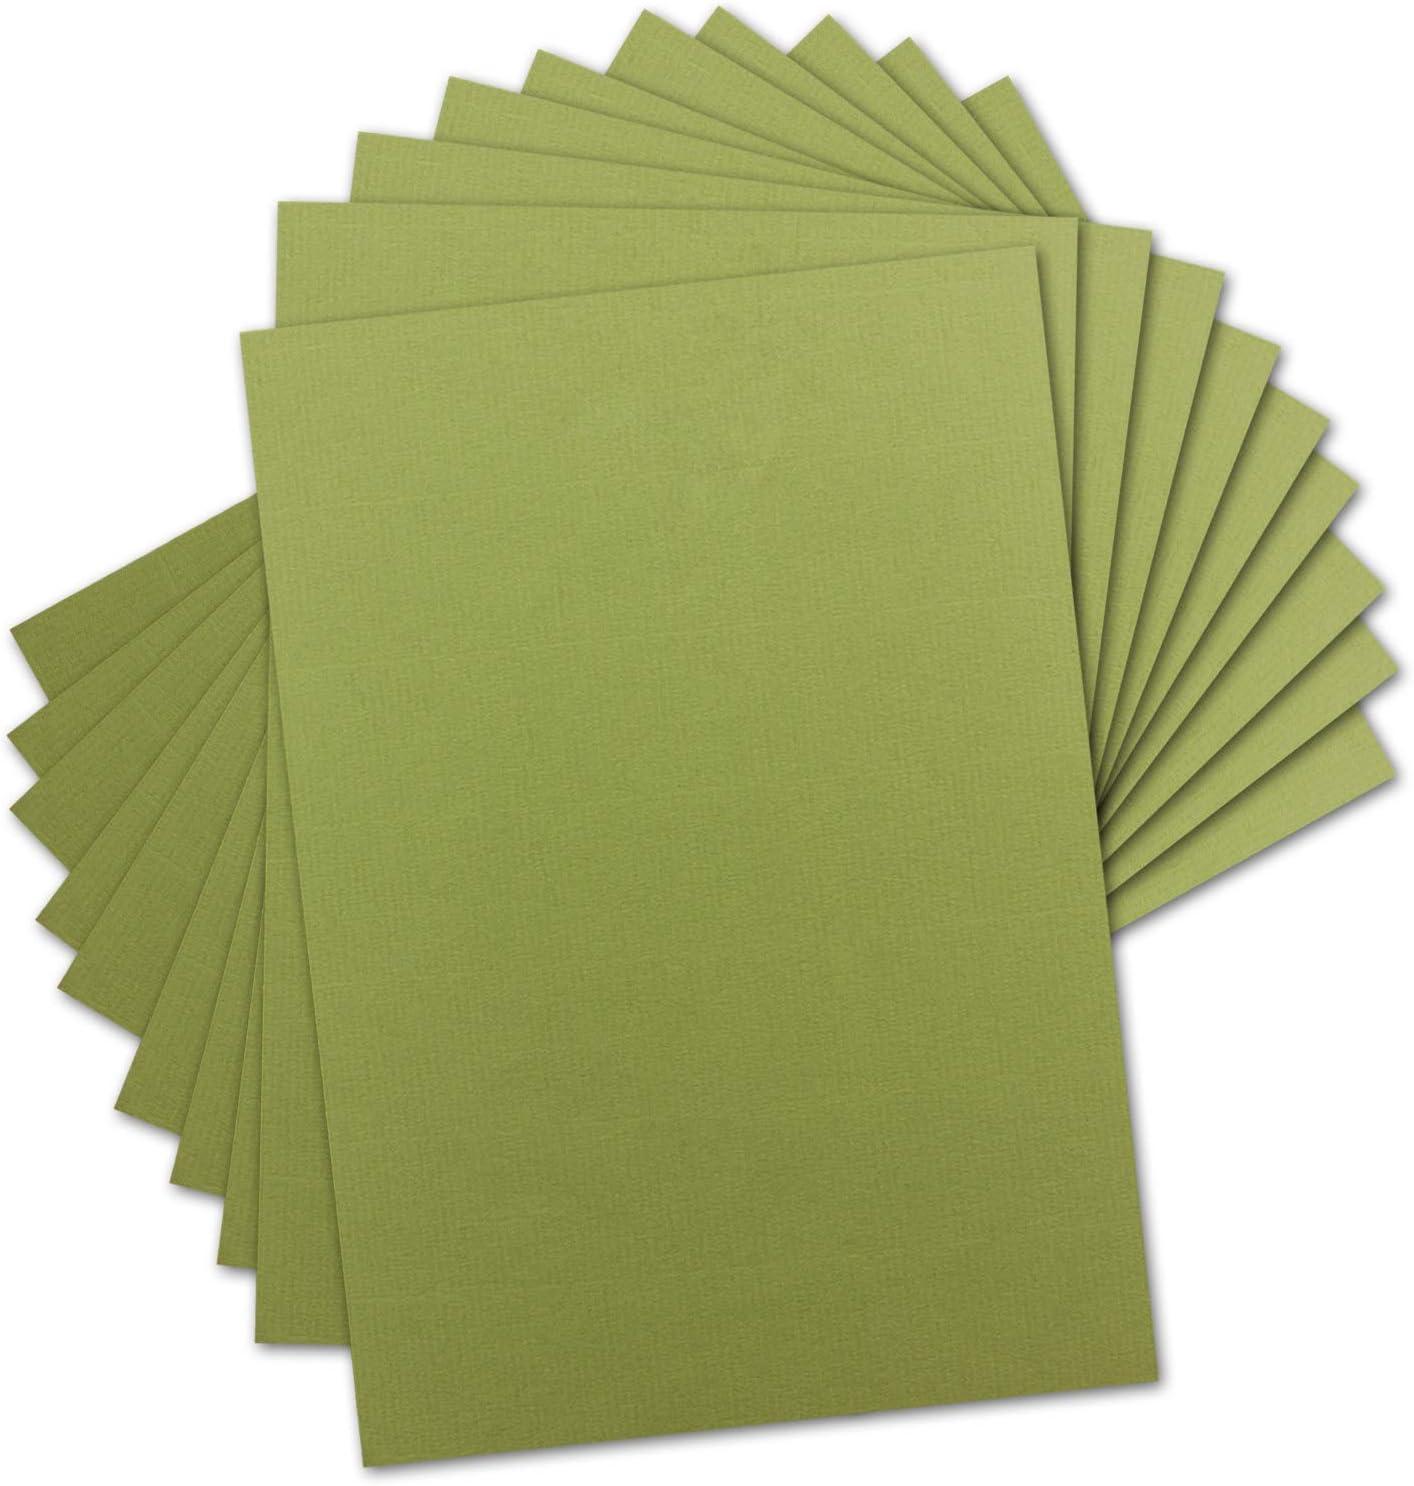 50 Blatt Ton-Karton DIN A4 Gl/üxx-Agent Farbe: Pistazie -Ton-Papier 160 g//m/² Gerippte Oberfl/äche Ton-Zeichen-Papier Bastel-Papier Bastel-Karton